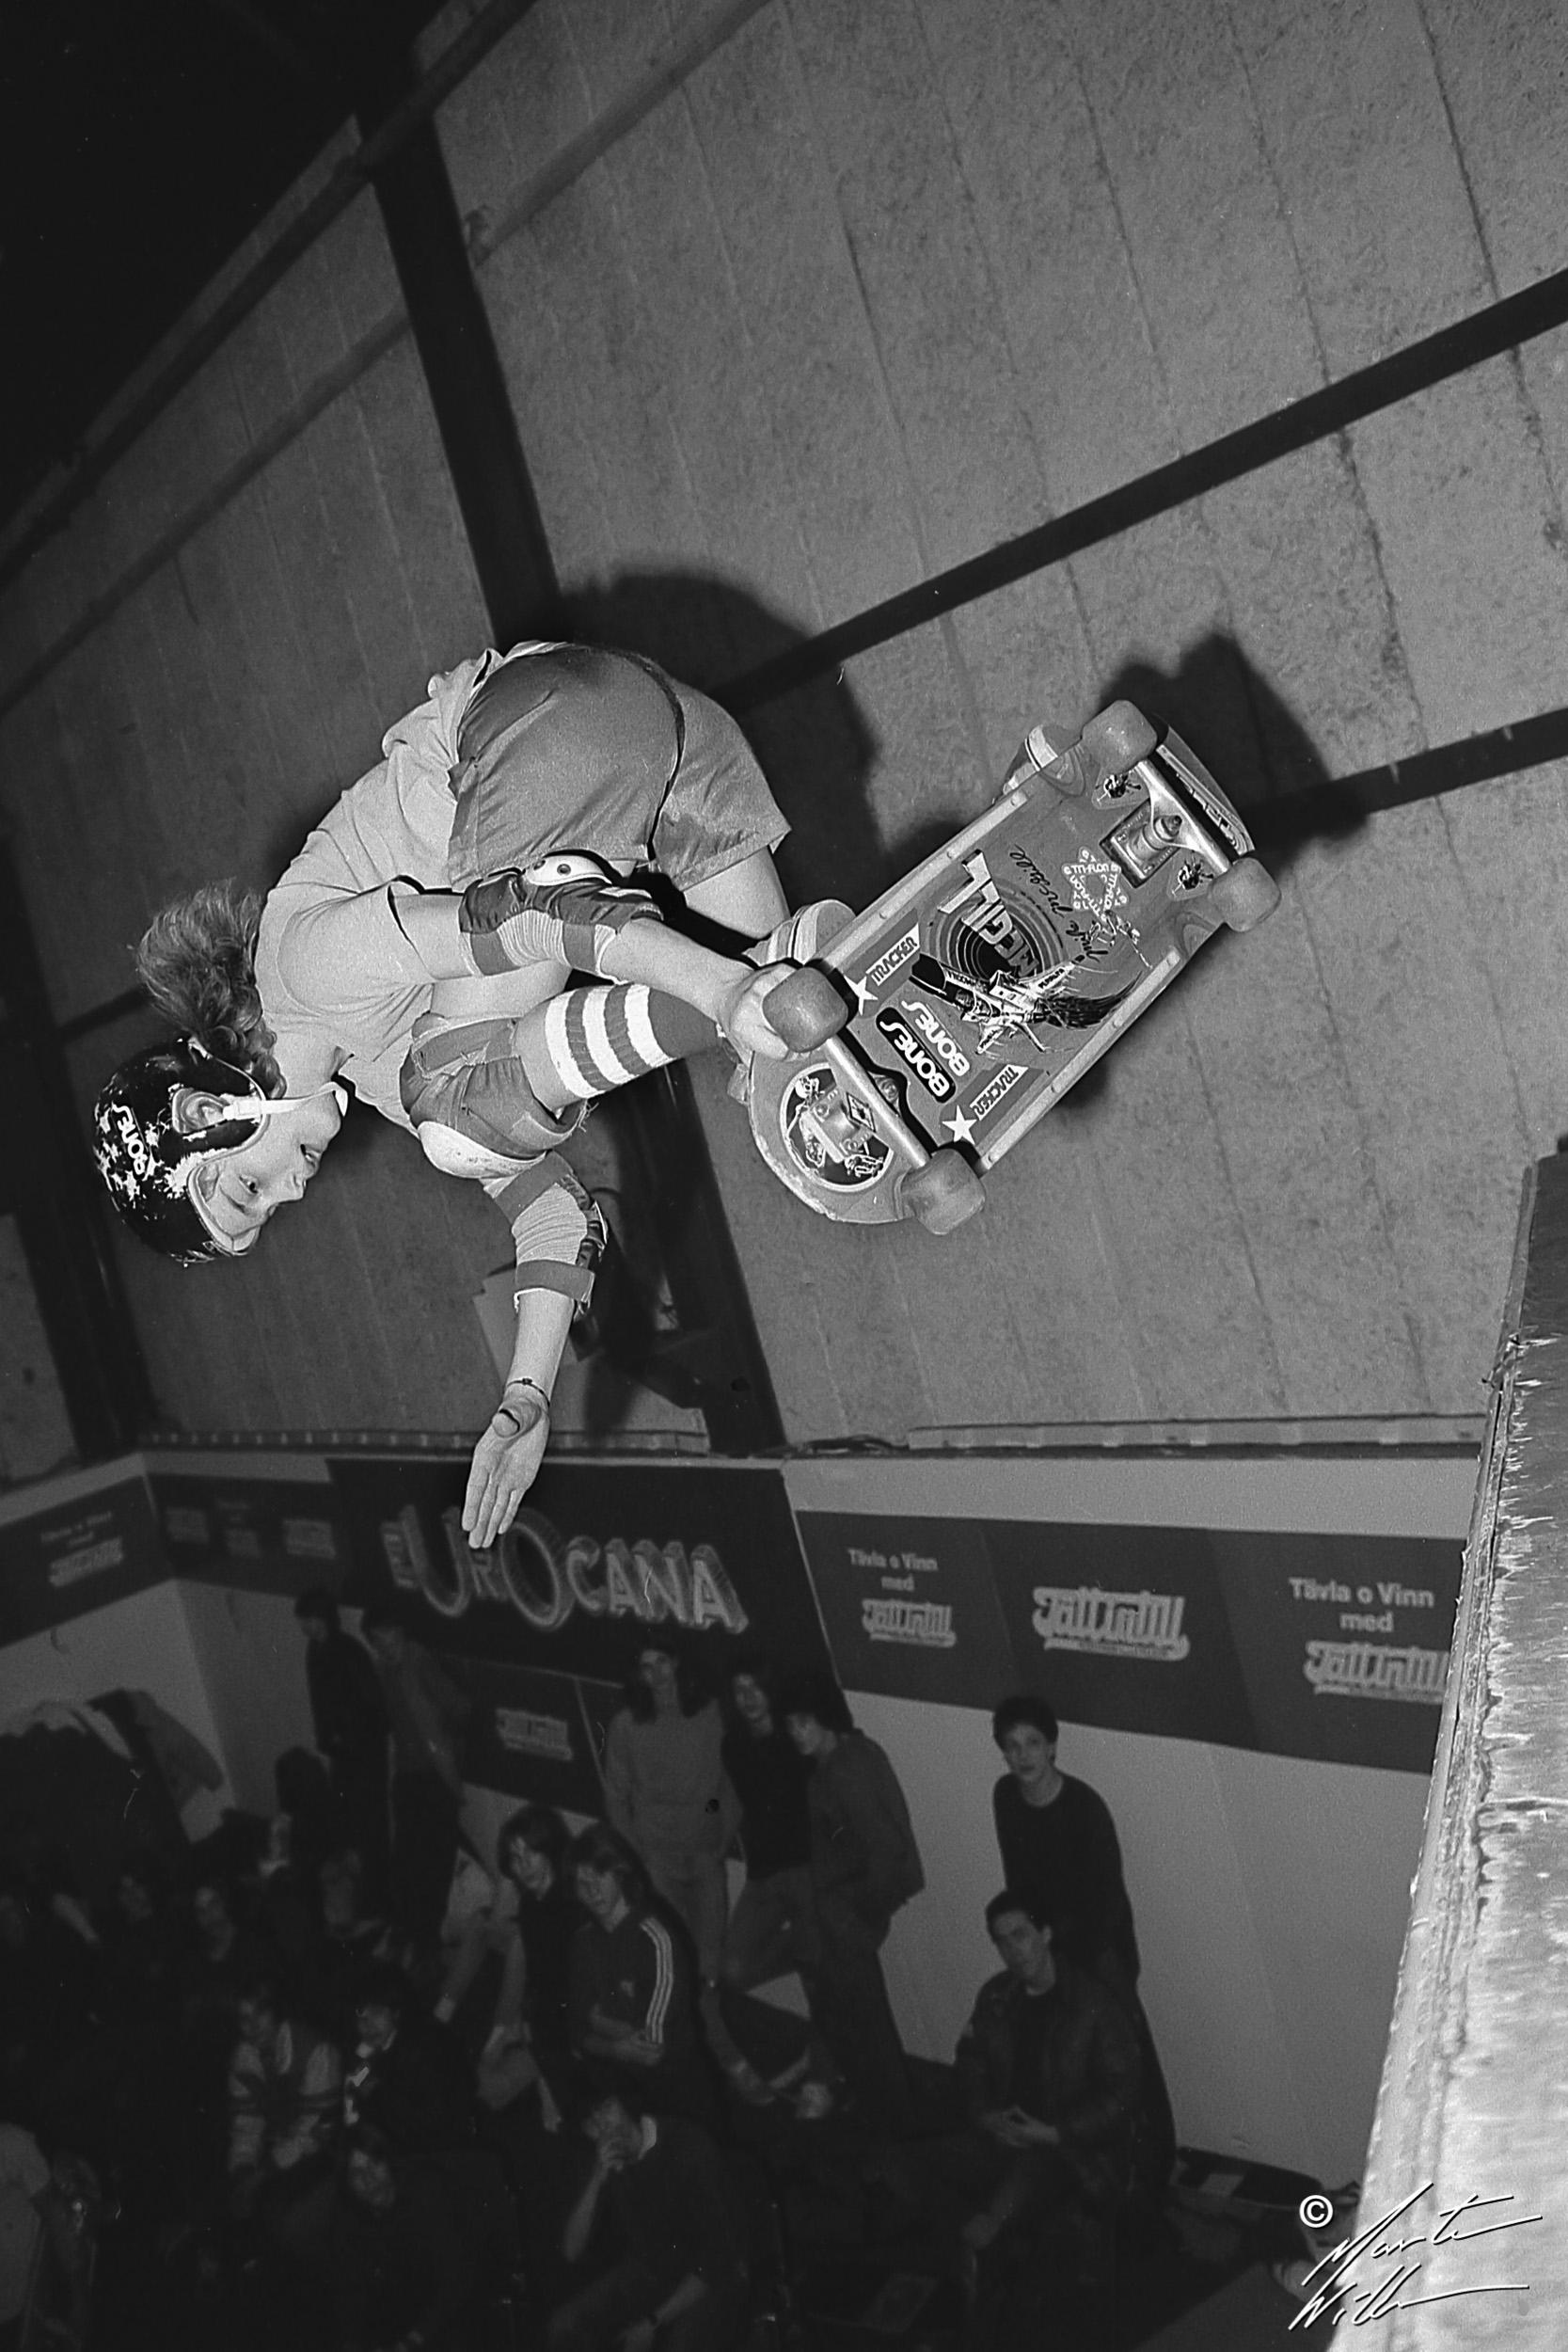 Anders Osborne, Backside air, Eurocana Open, Stockholm 1982